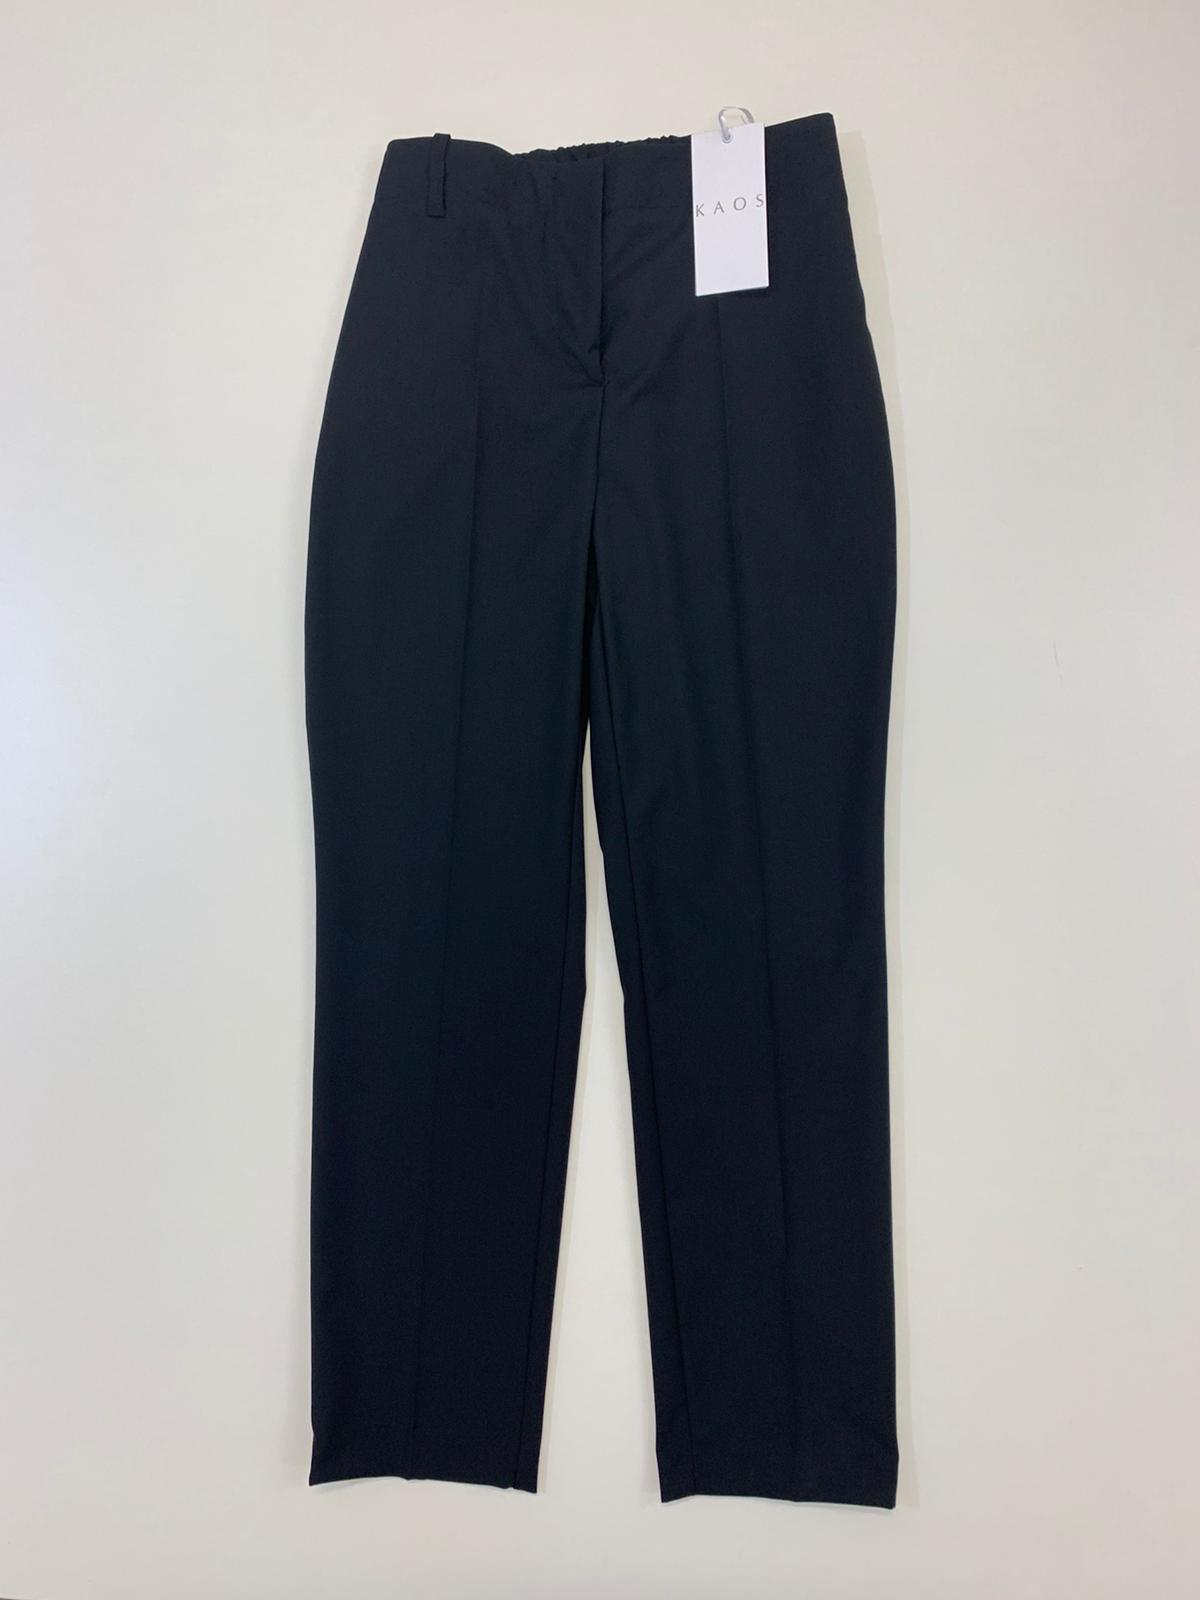 Pantalone Donna Kaos Collection Molla Nero